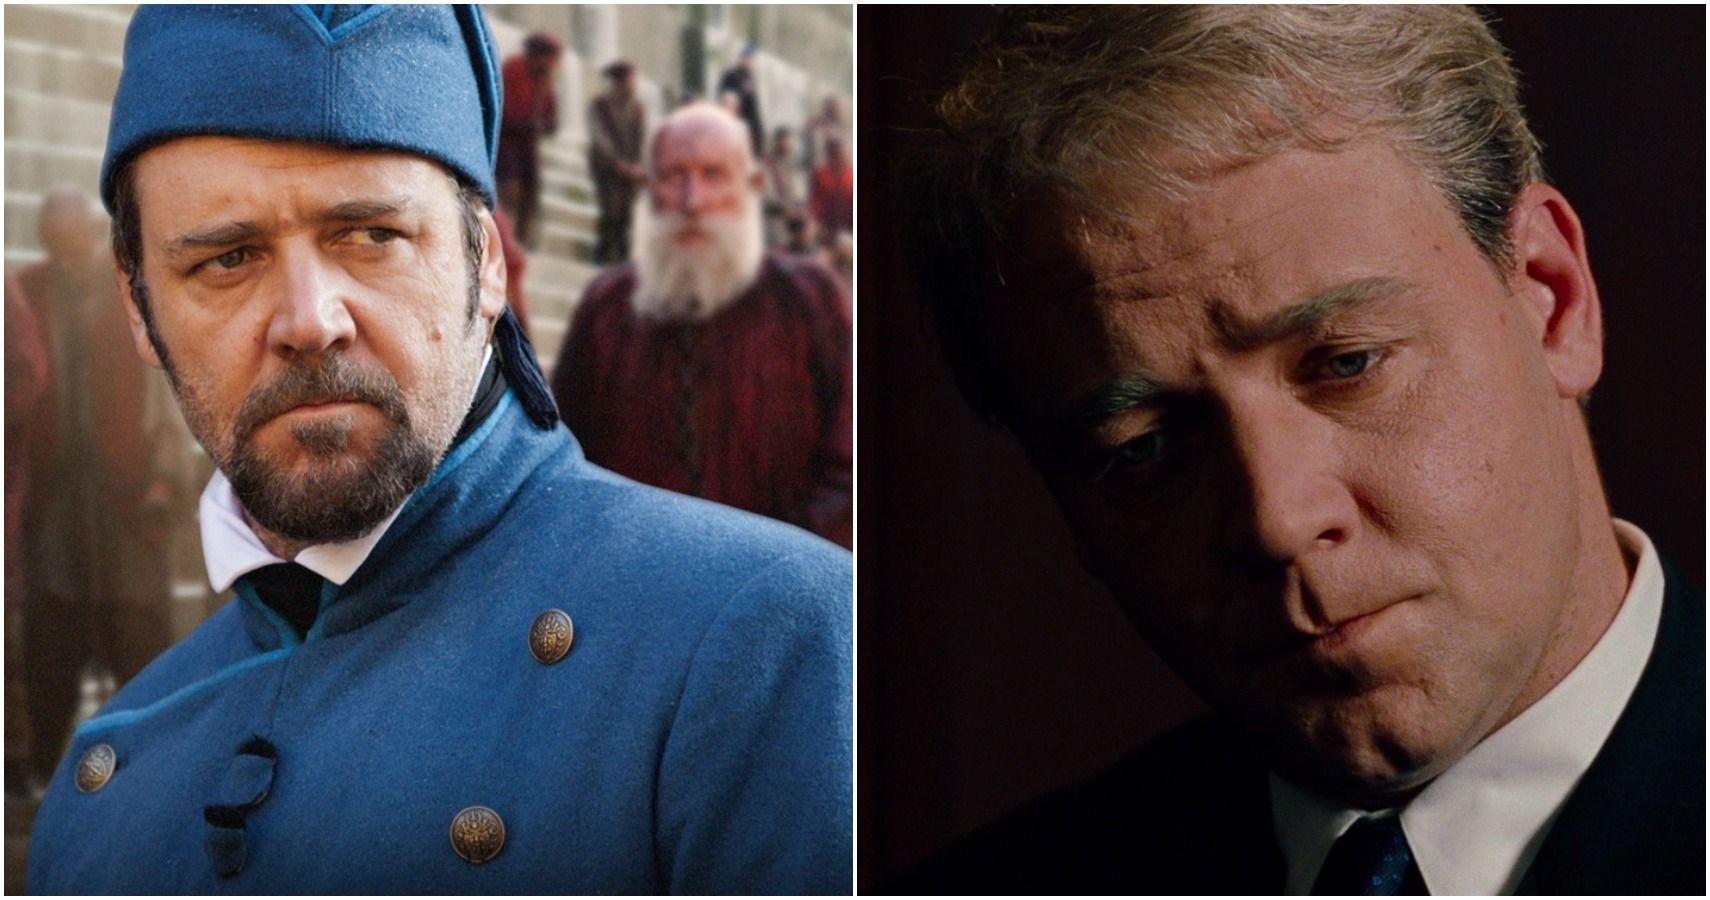 10 Best Russell Crowe Movies, According To IMDb | ScreenRant